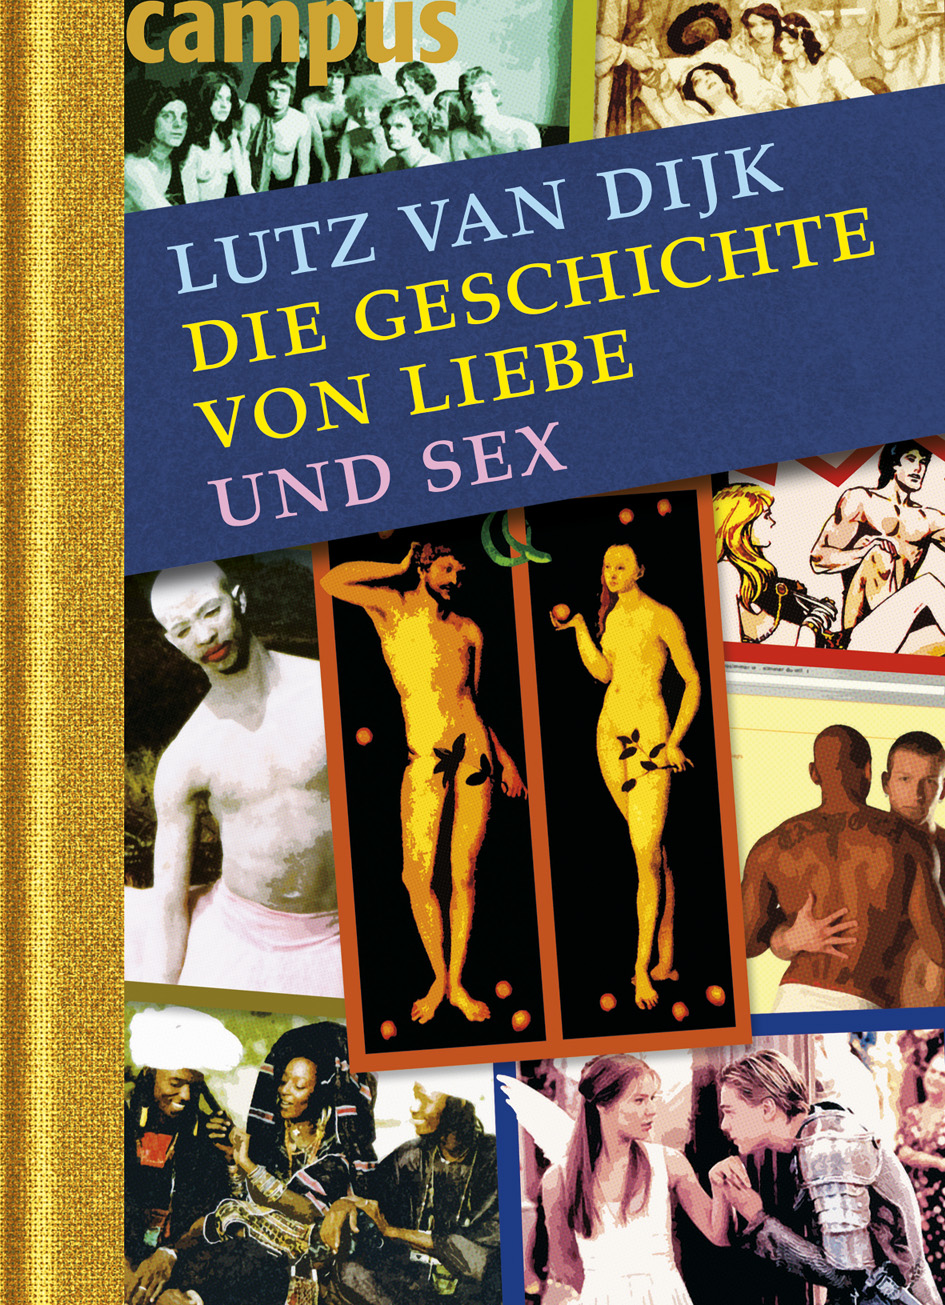 apps on sex Frankfurt am Main